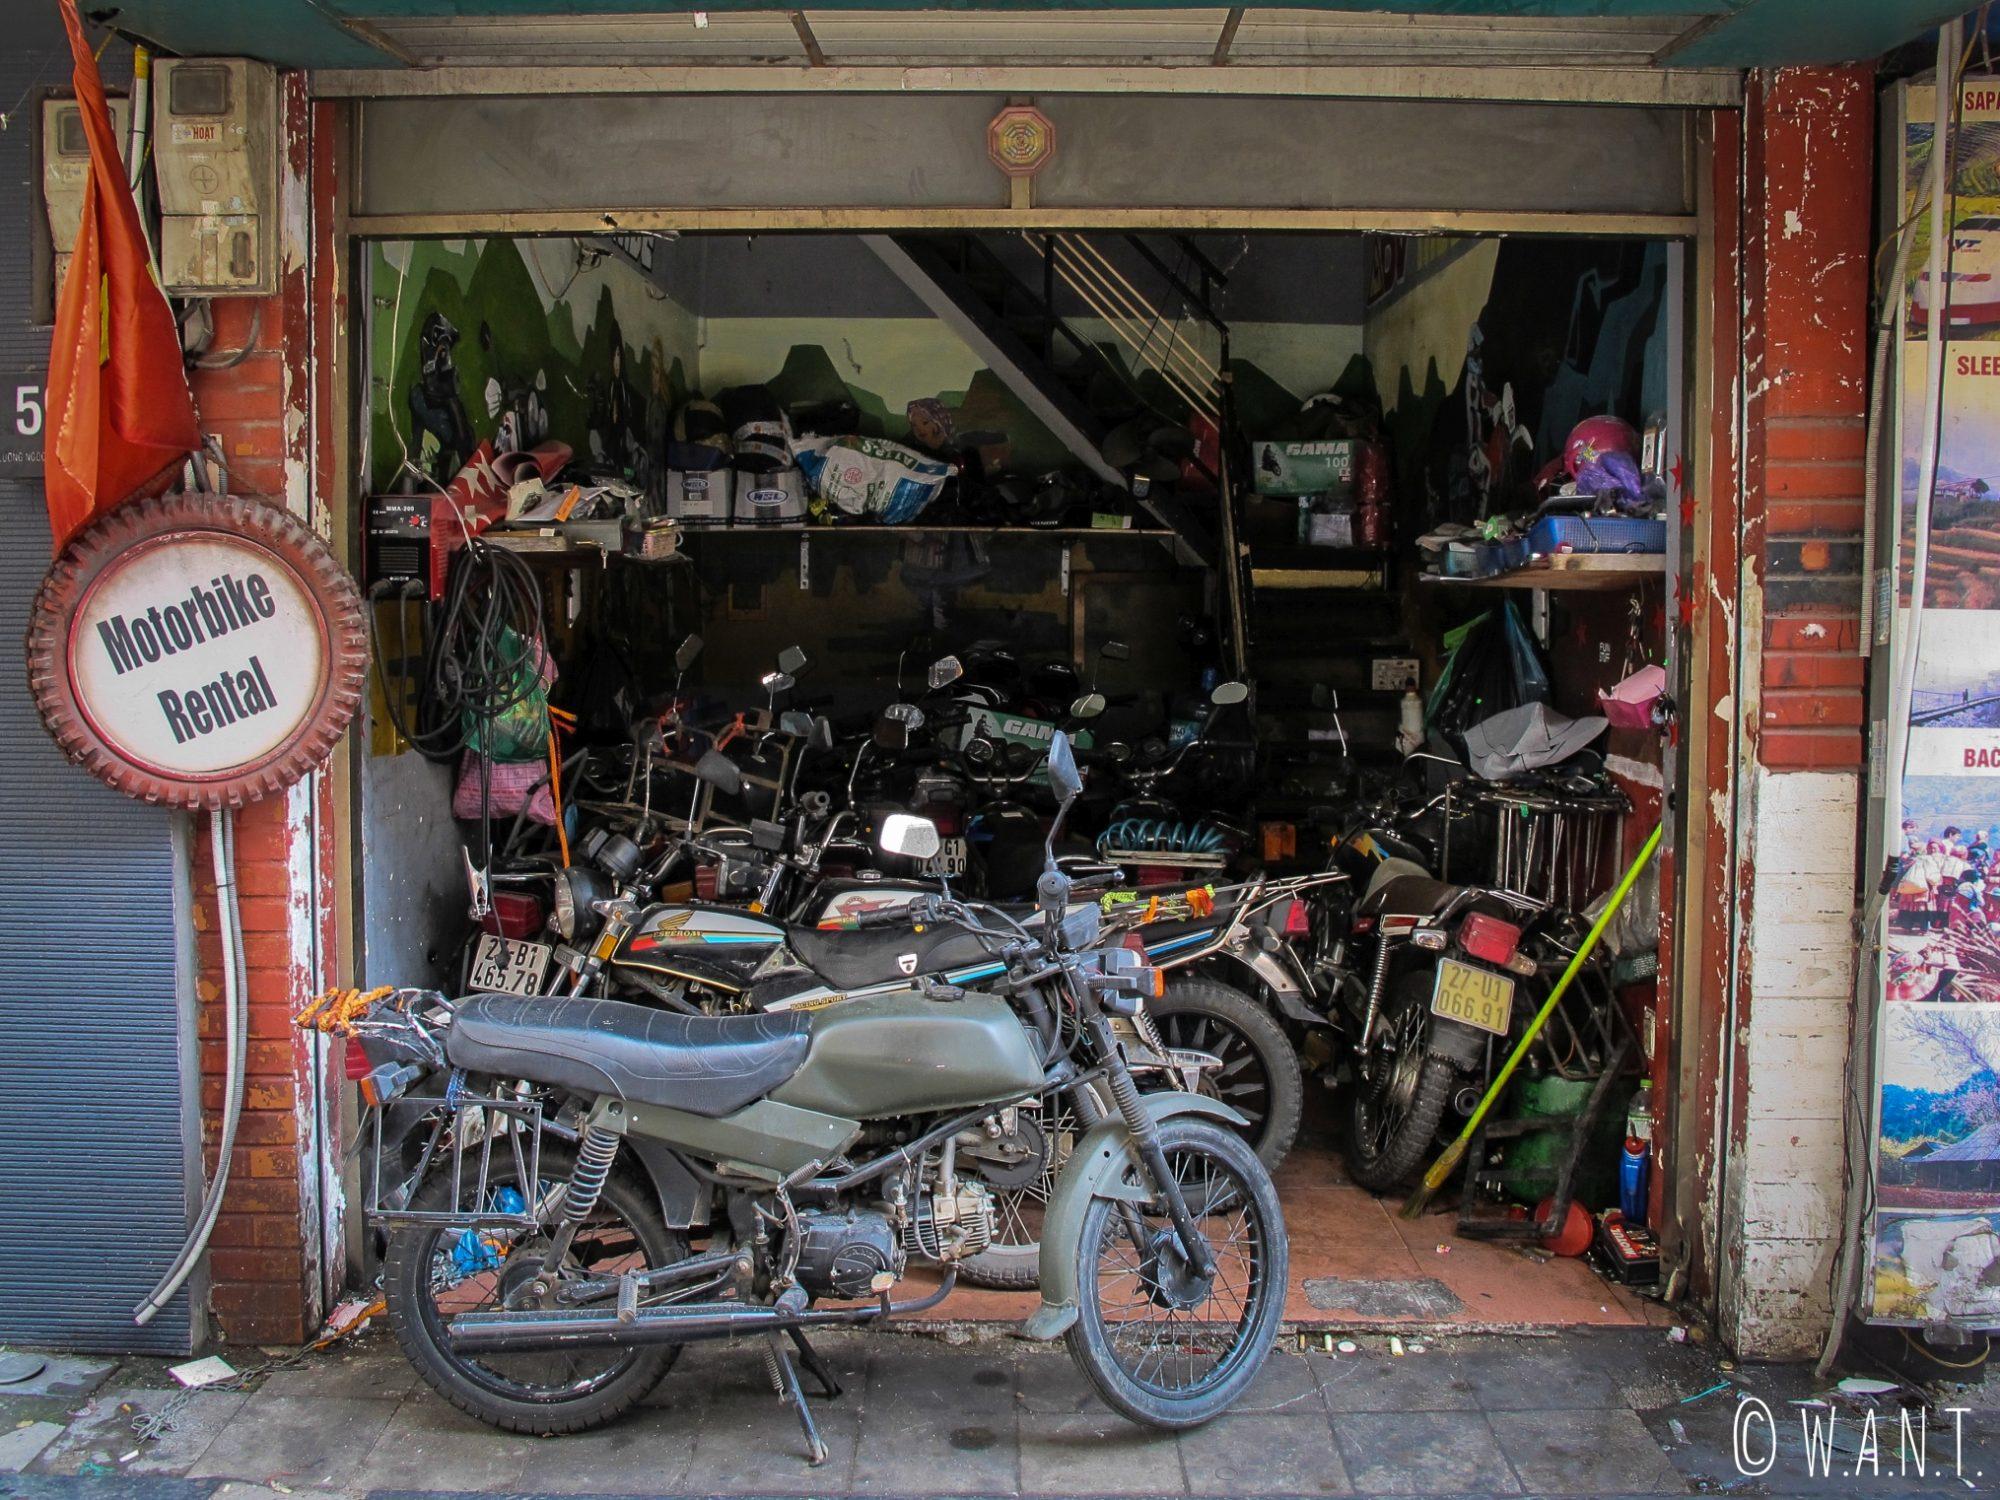 Échoppe de motos dans les rues de Hanoï